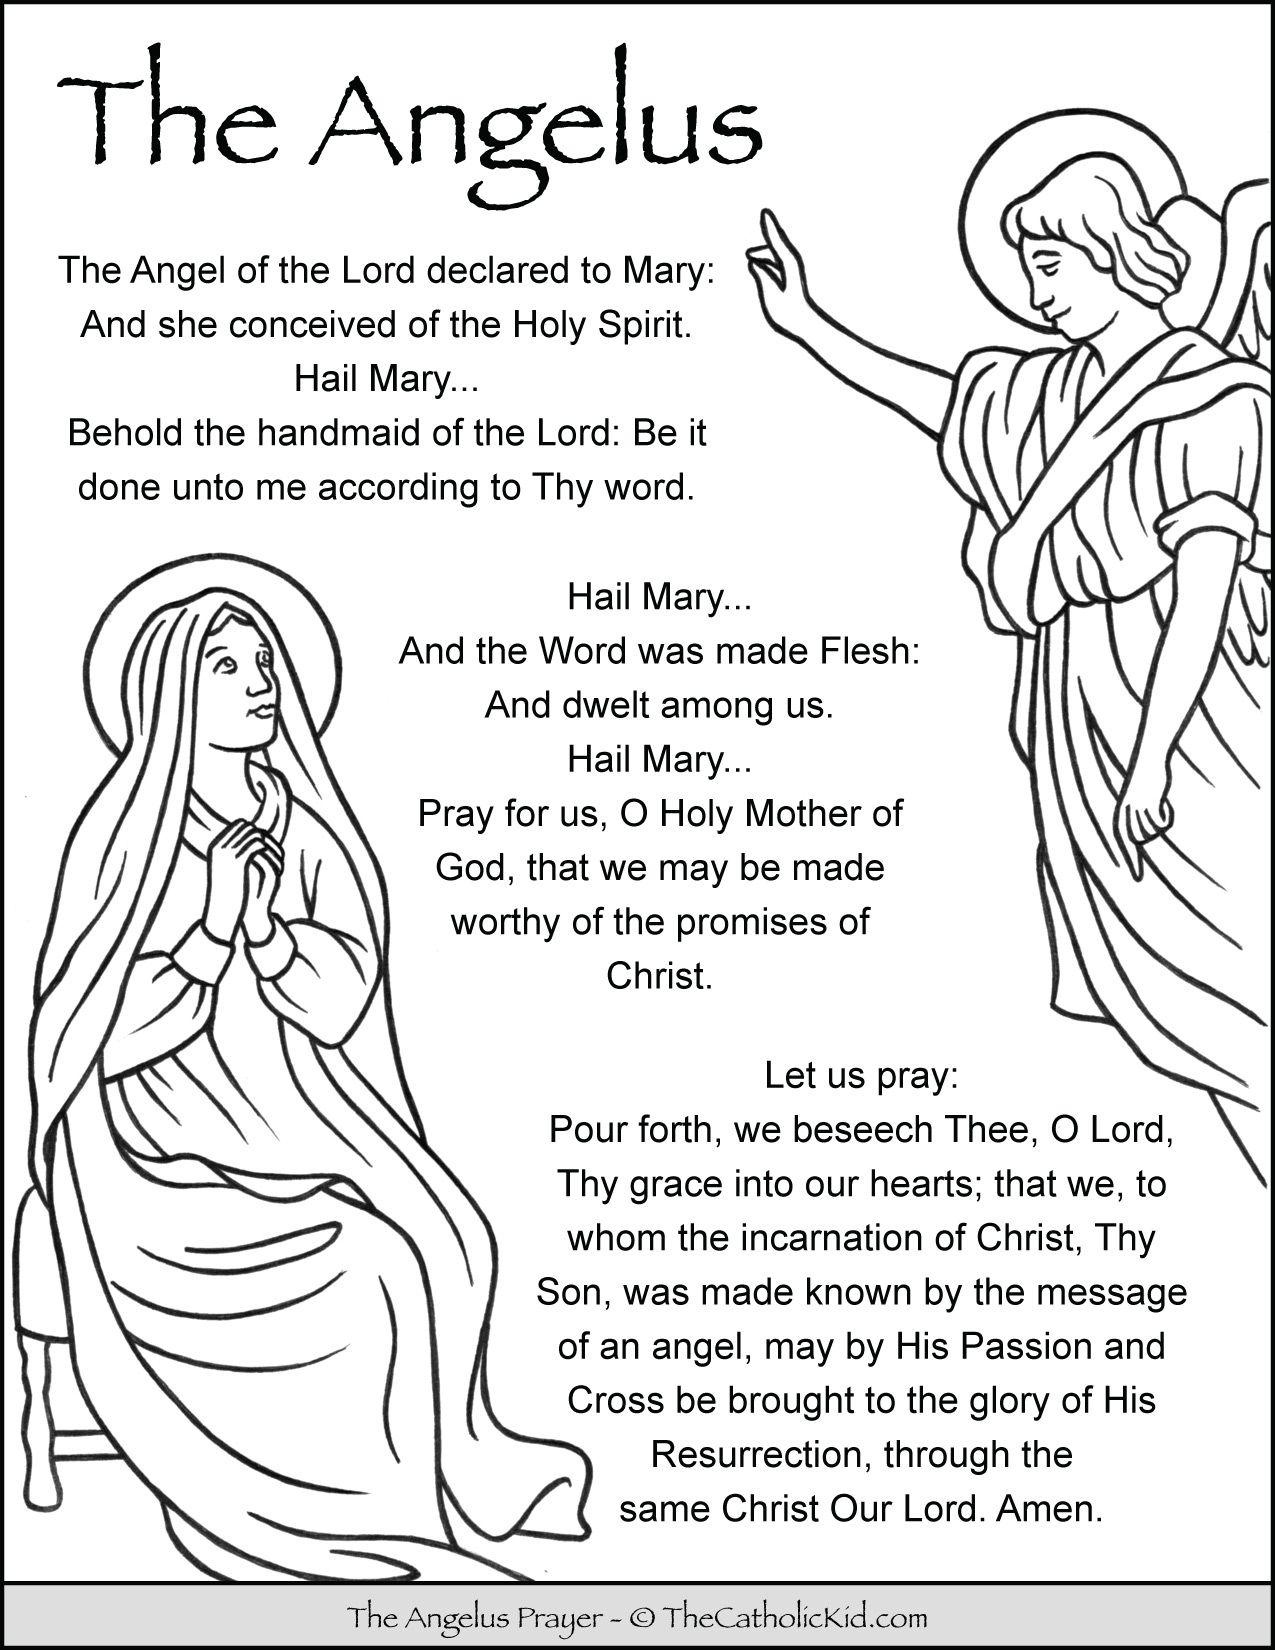 Angelus Prayer Coloring Page Thecatholickid Com Prayers To Mary Prayers Prayers For Children